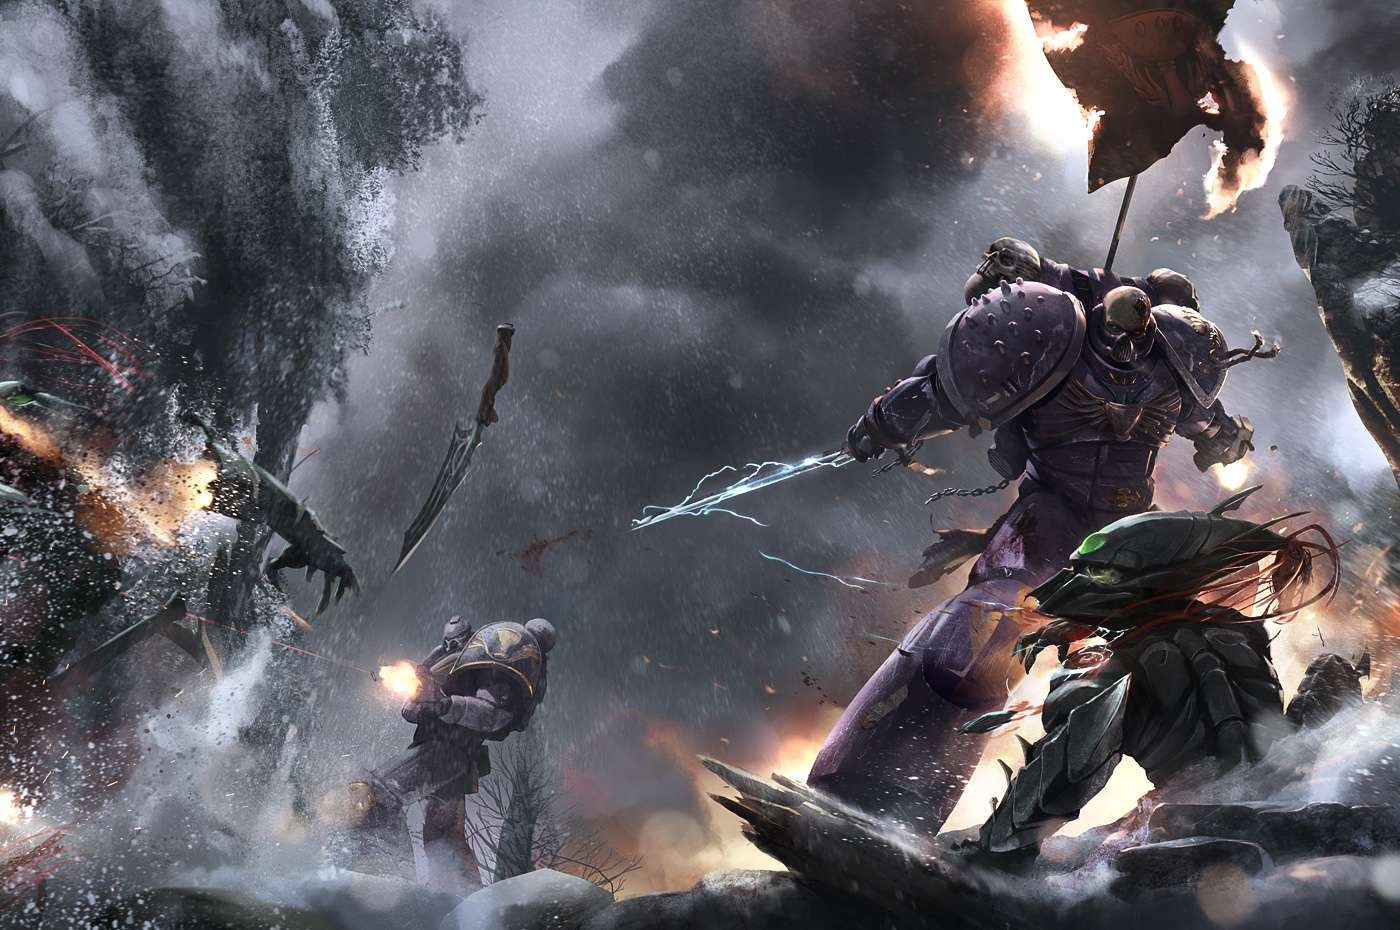 [W40K] Collection d'images : Warhammer 40K divers et inclassables - Page 2 Black_11